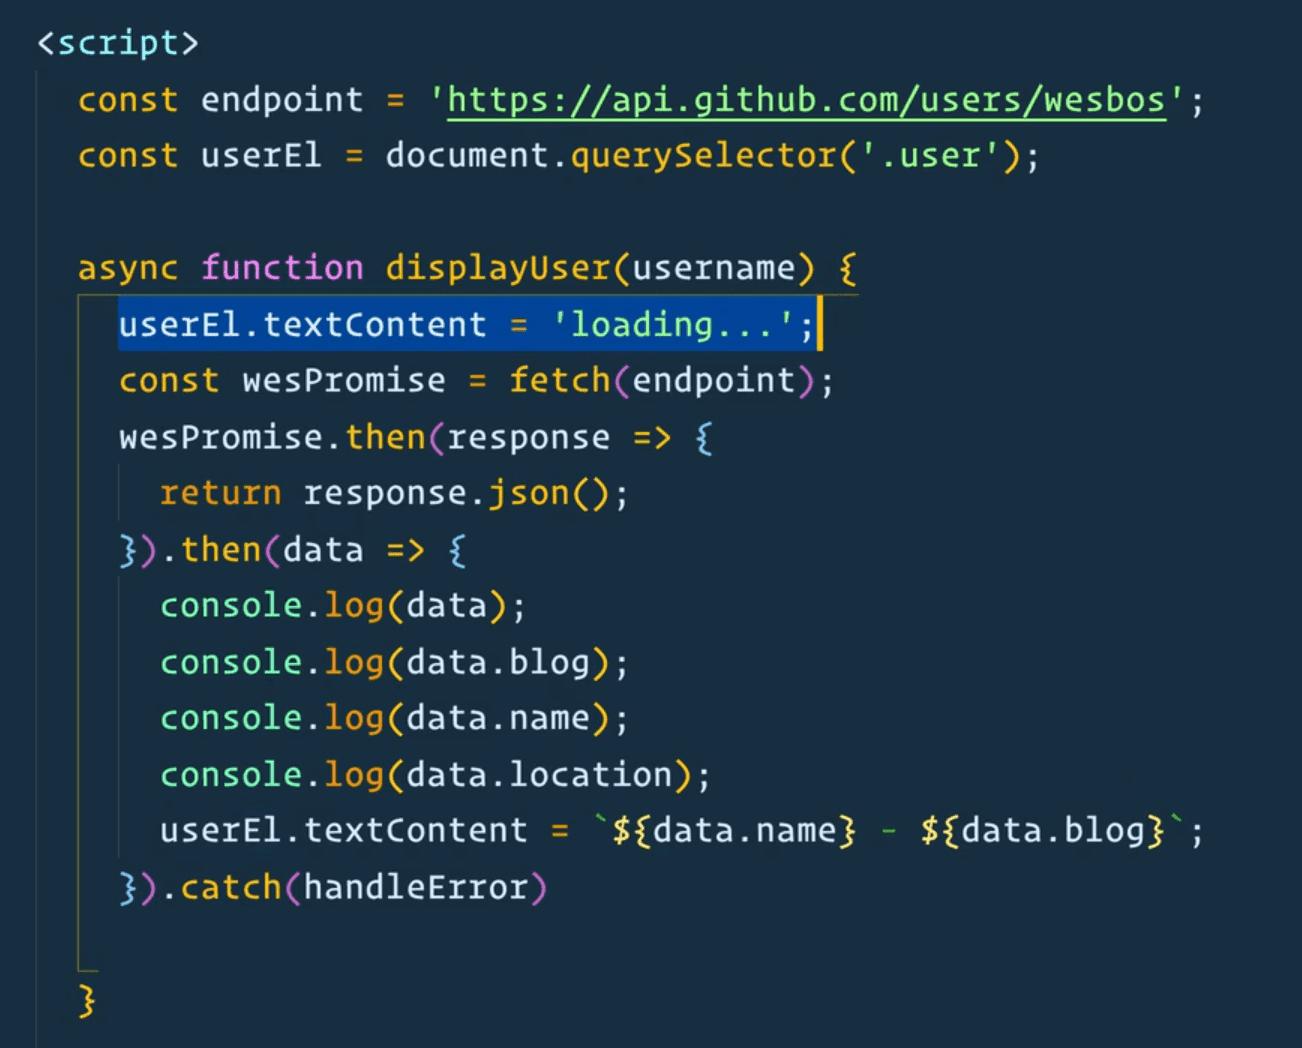 code snippet of displayUser function